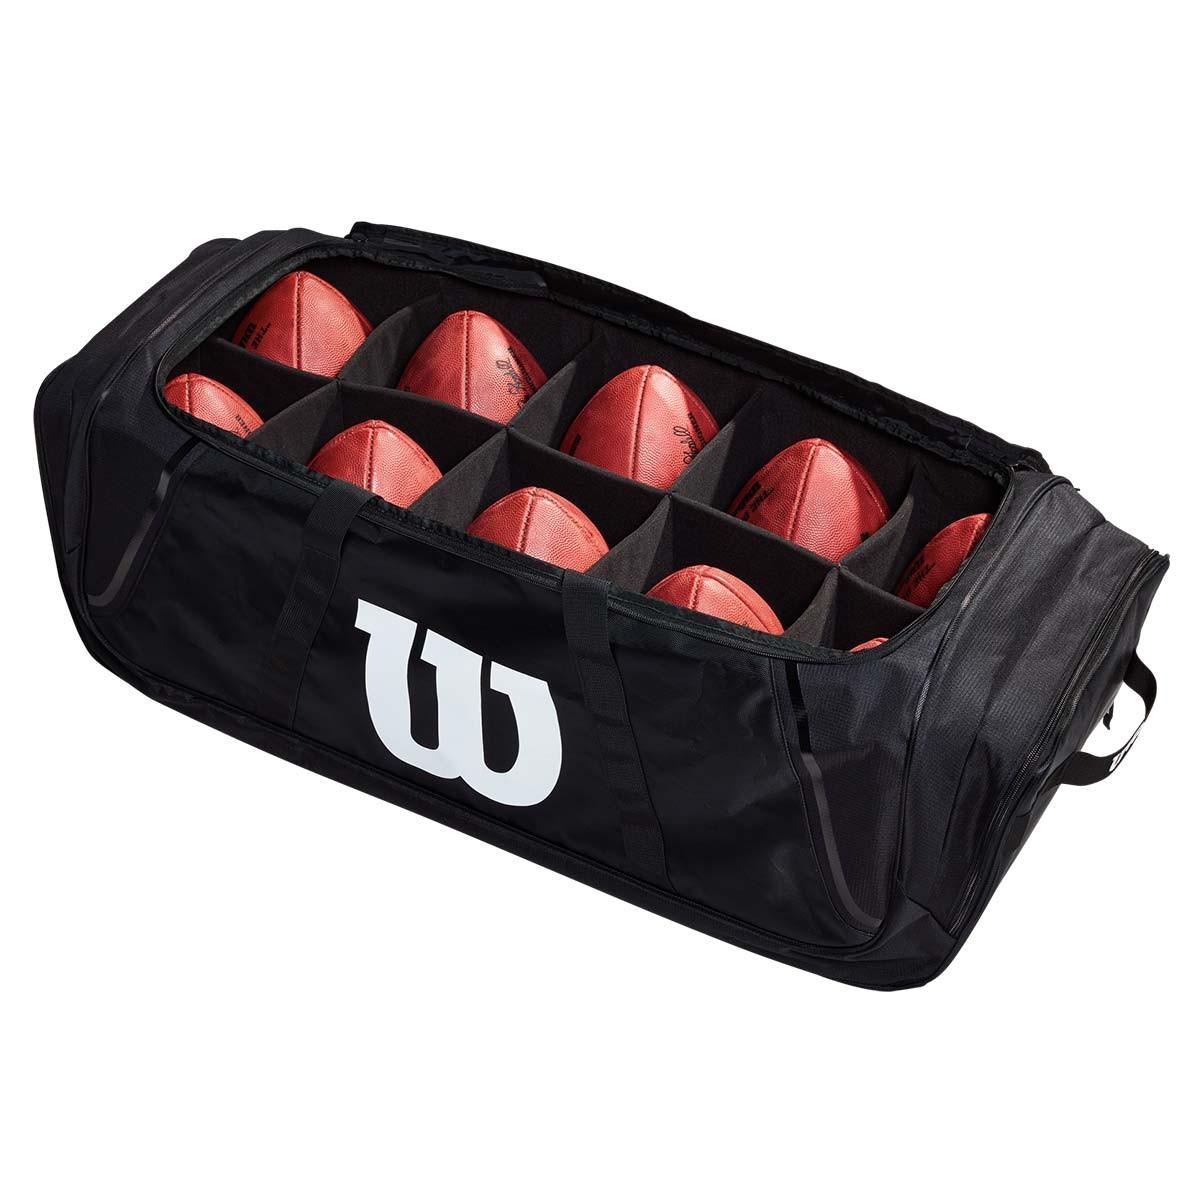 Wilson 10 Football Duffle Bag